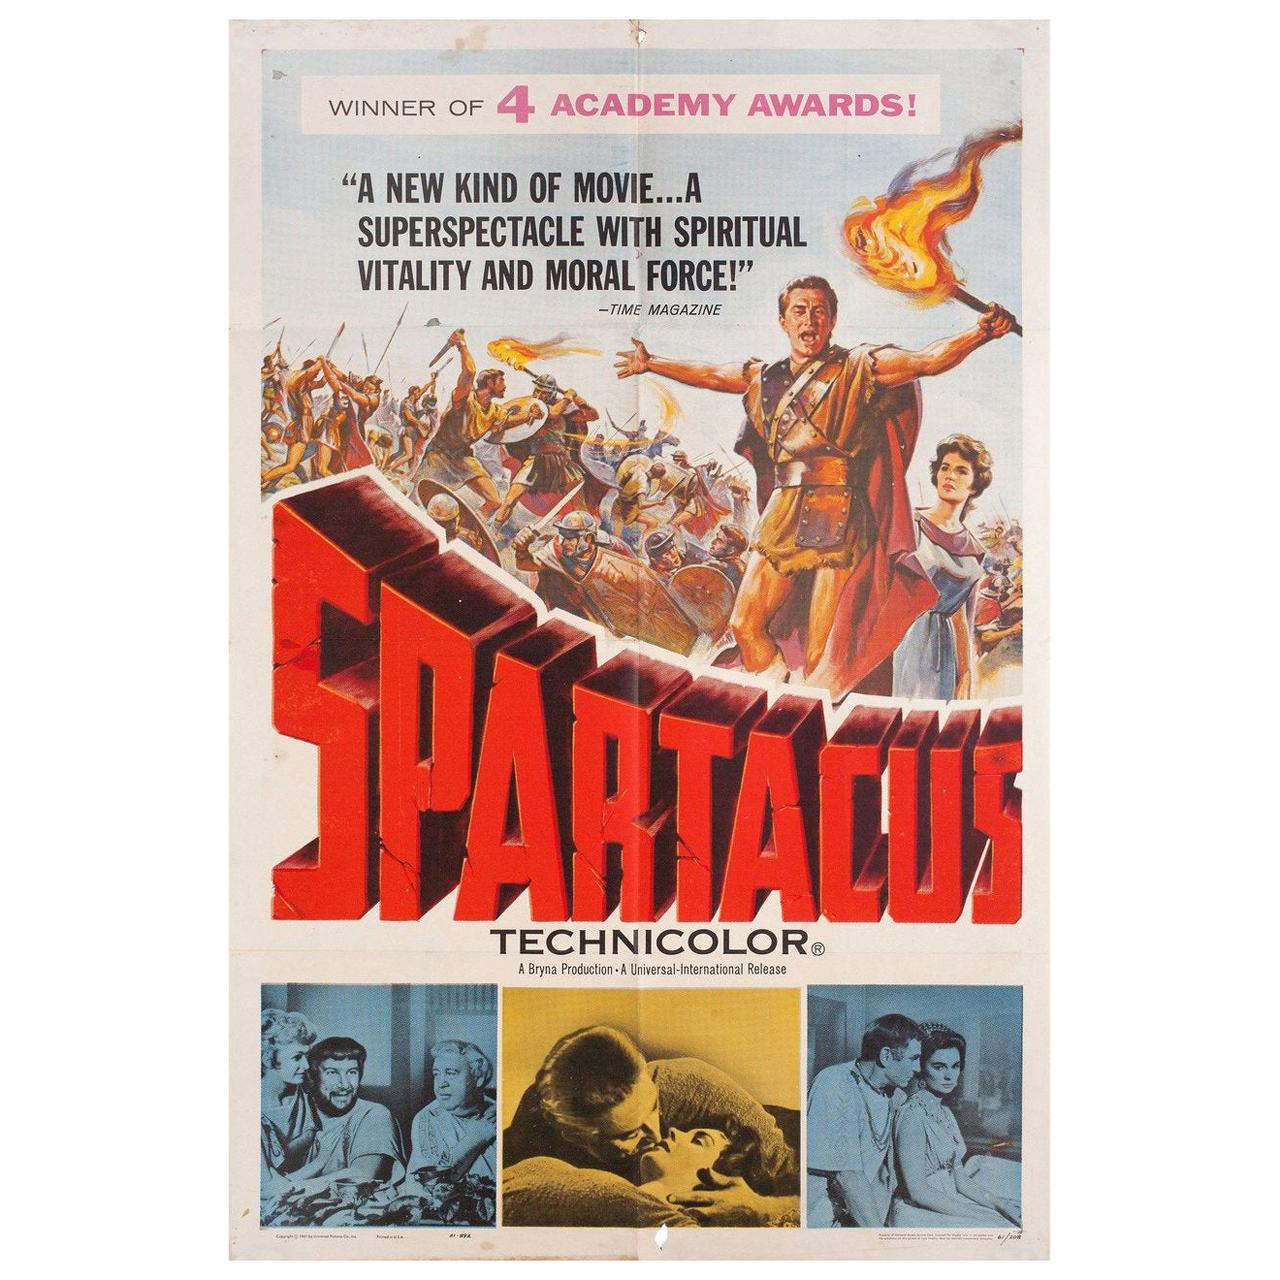 Spartacus 1961 U.S. One Sheet Film Poster